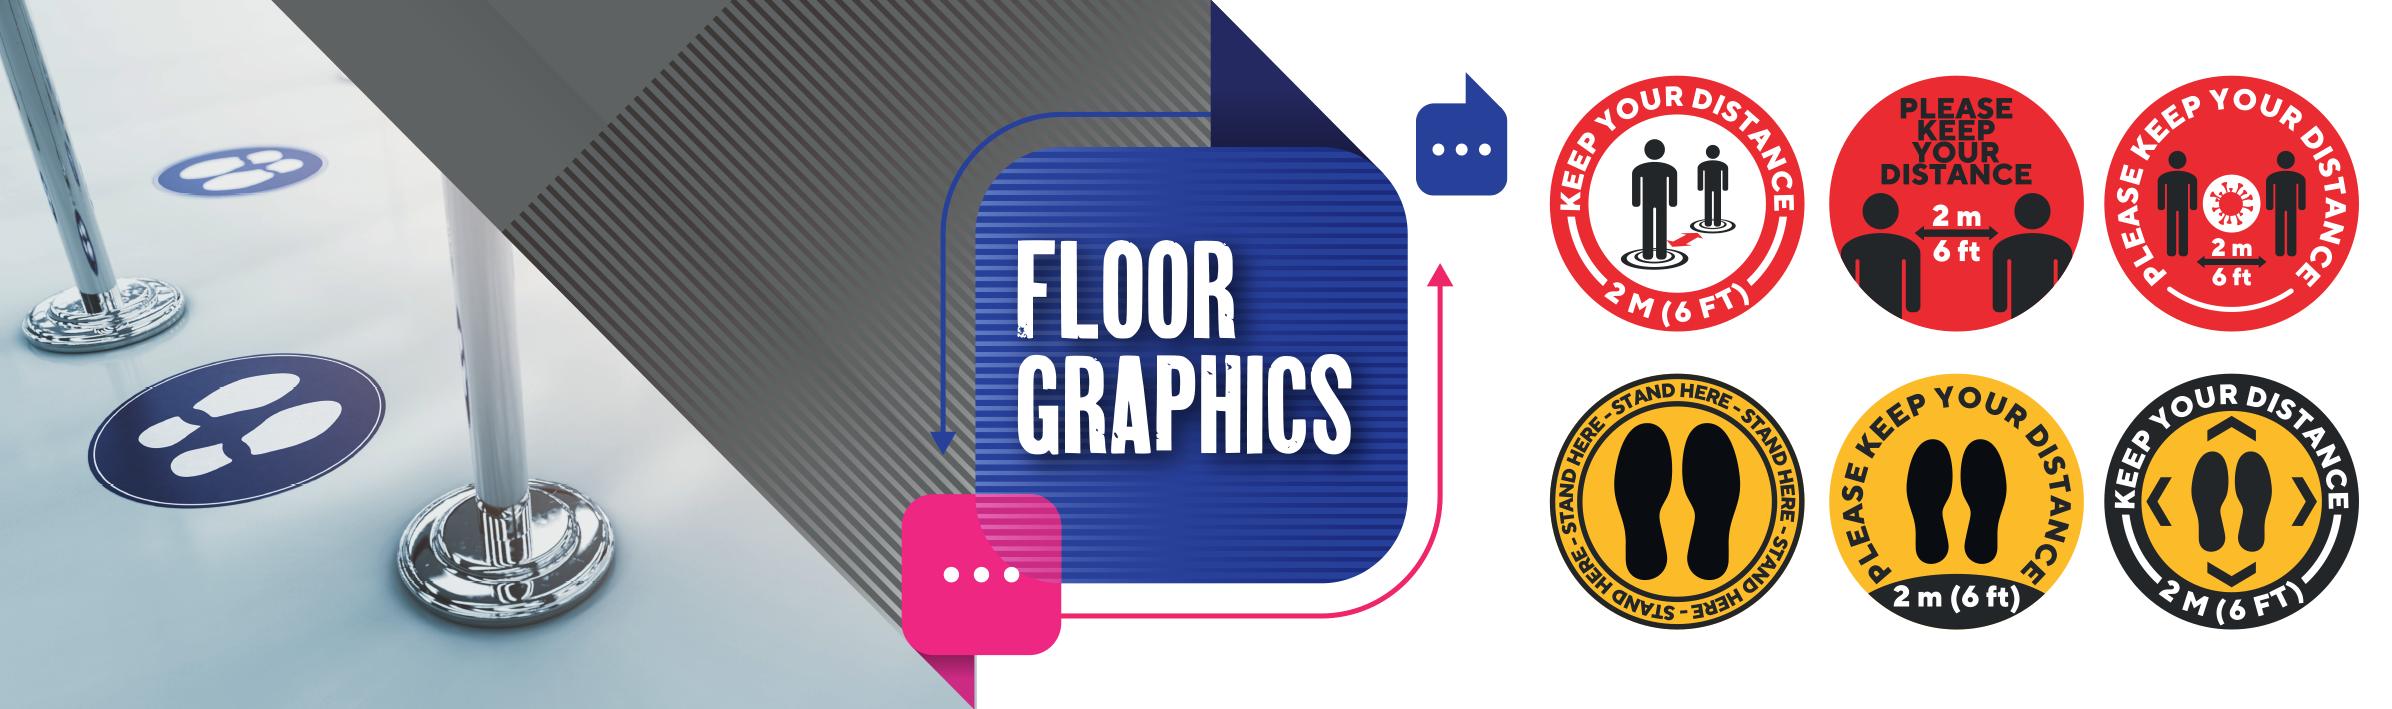 Floor Graphics Product Slider 2021